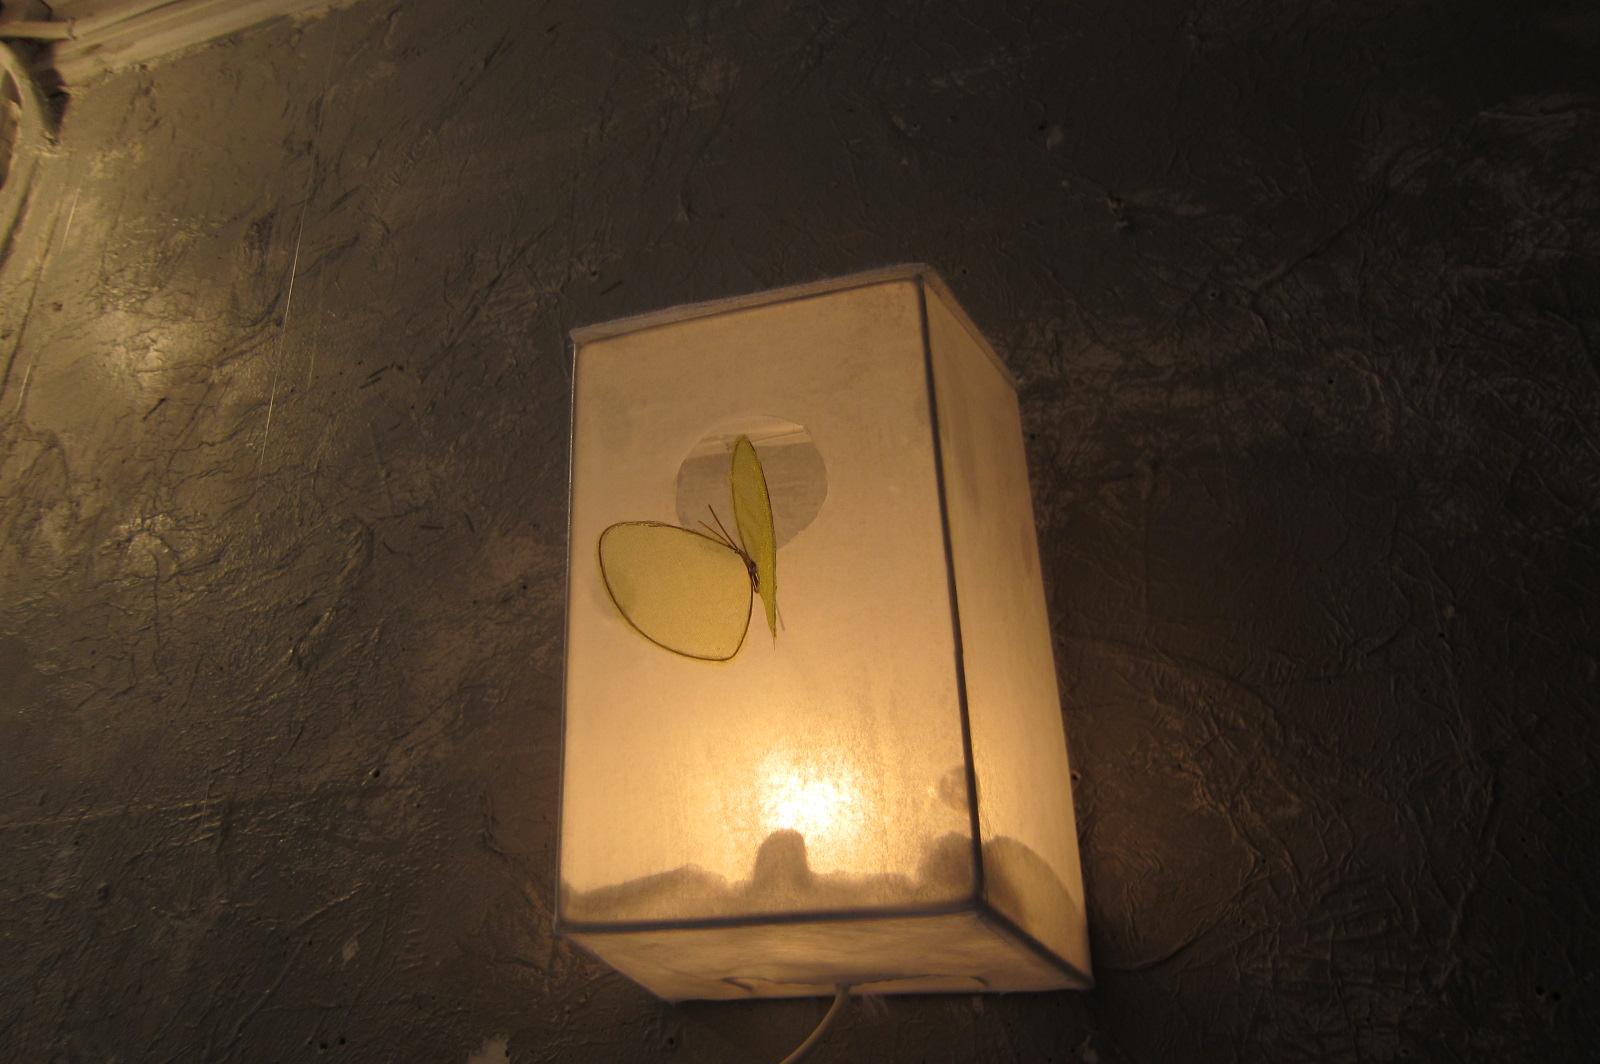 2020) 「jobin. とpaterの二人展 『ハルナデ展2013』」 ニュー・スター 4月15 日(月)~4月29日(日)  _f0126829_121236.jpg